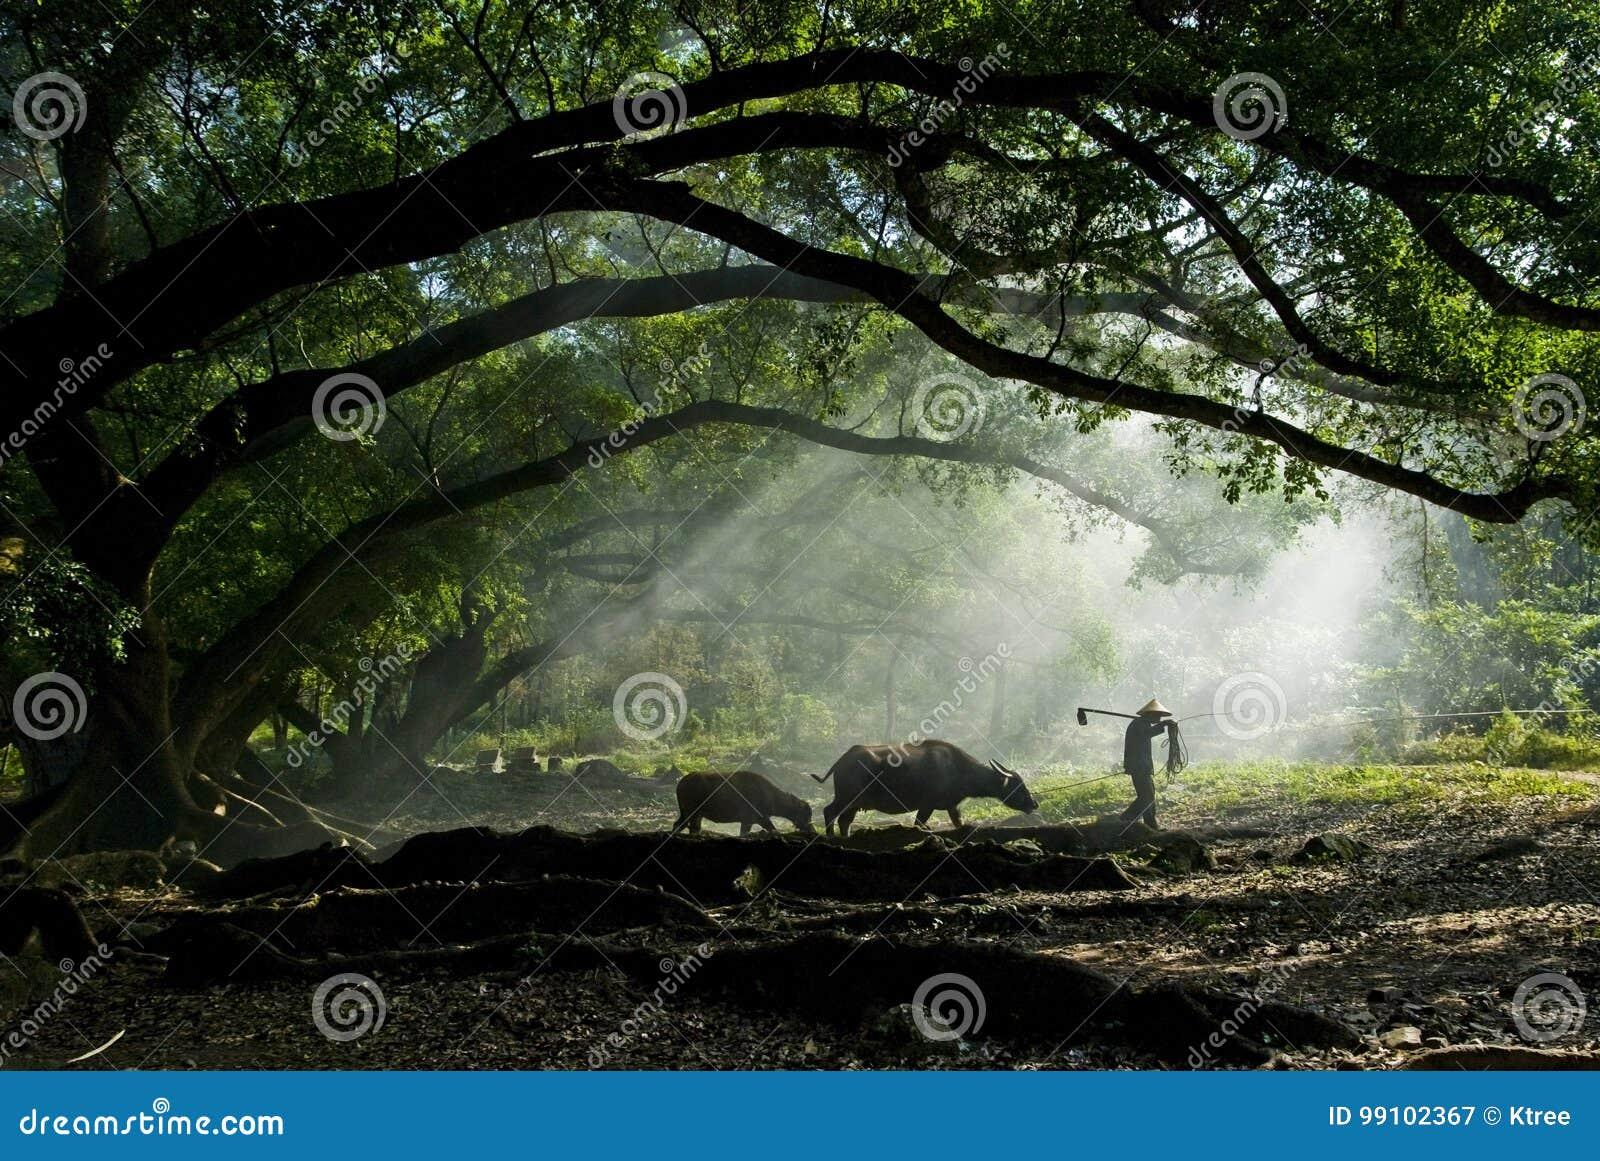 Viejo granjero debajo del baniano antiguo